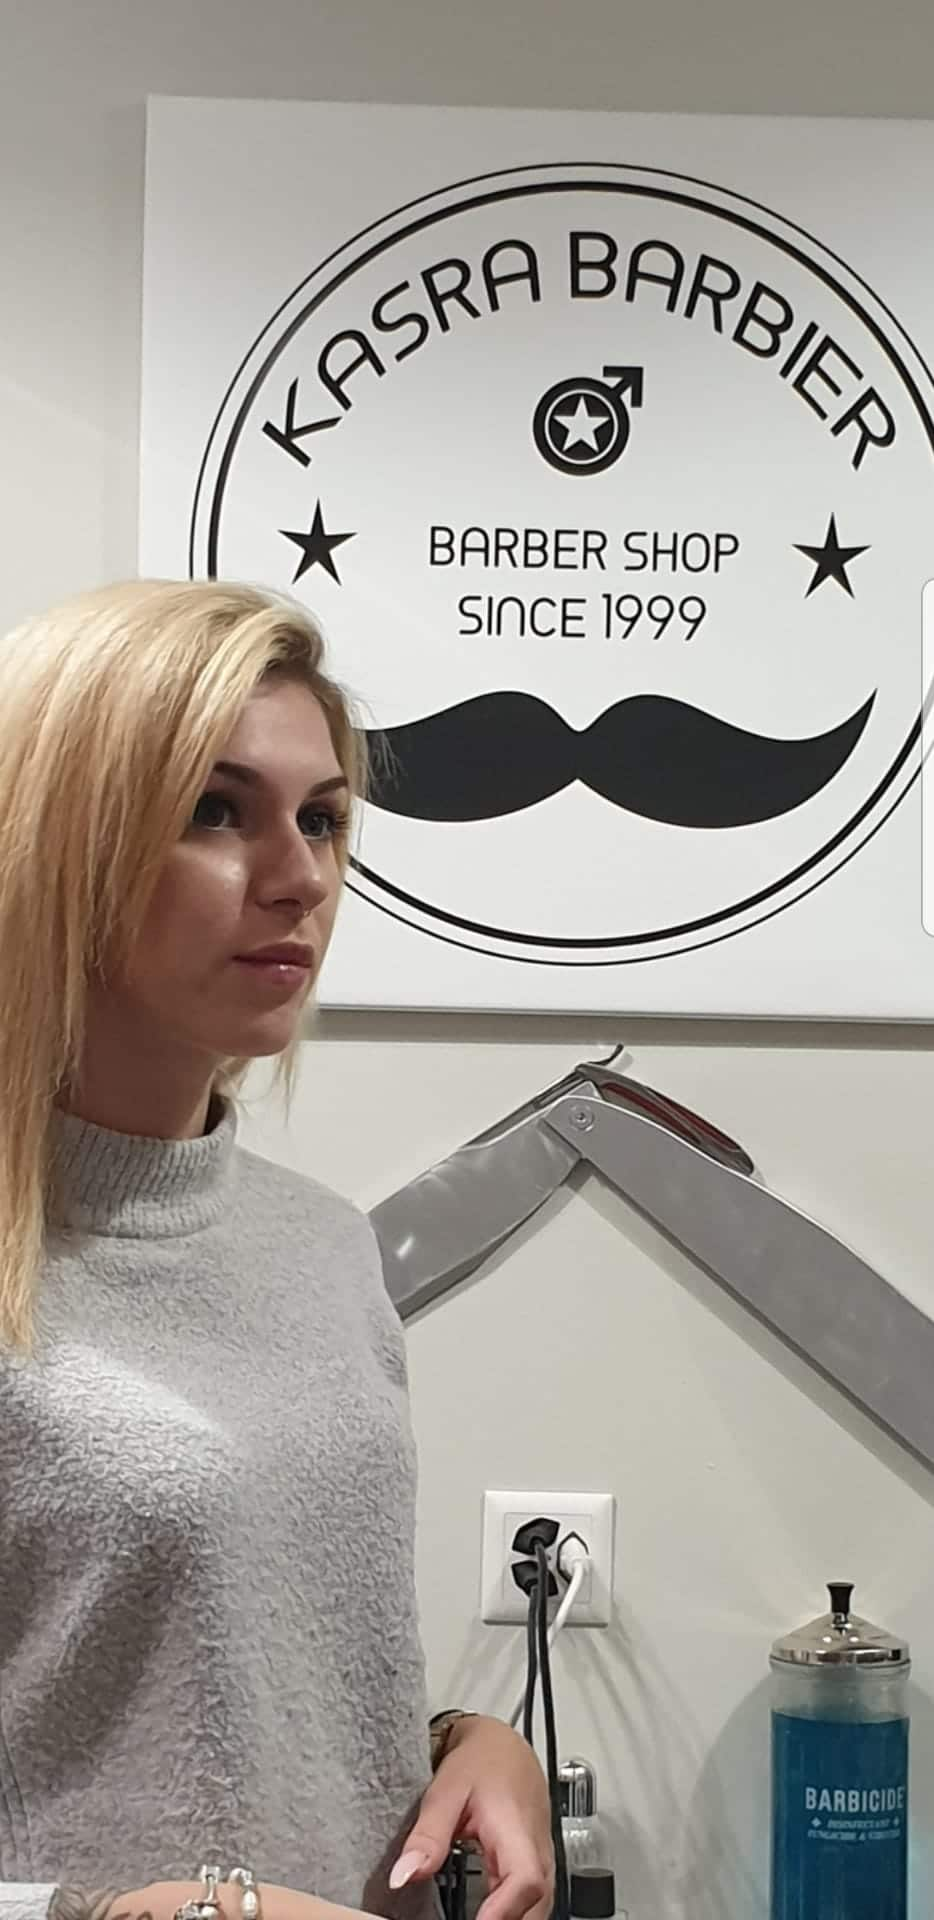 "<a href=""https://www.kasrabarbier.shop/about/renata/"">Renata</a>"